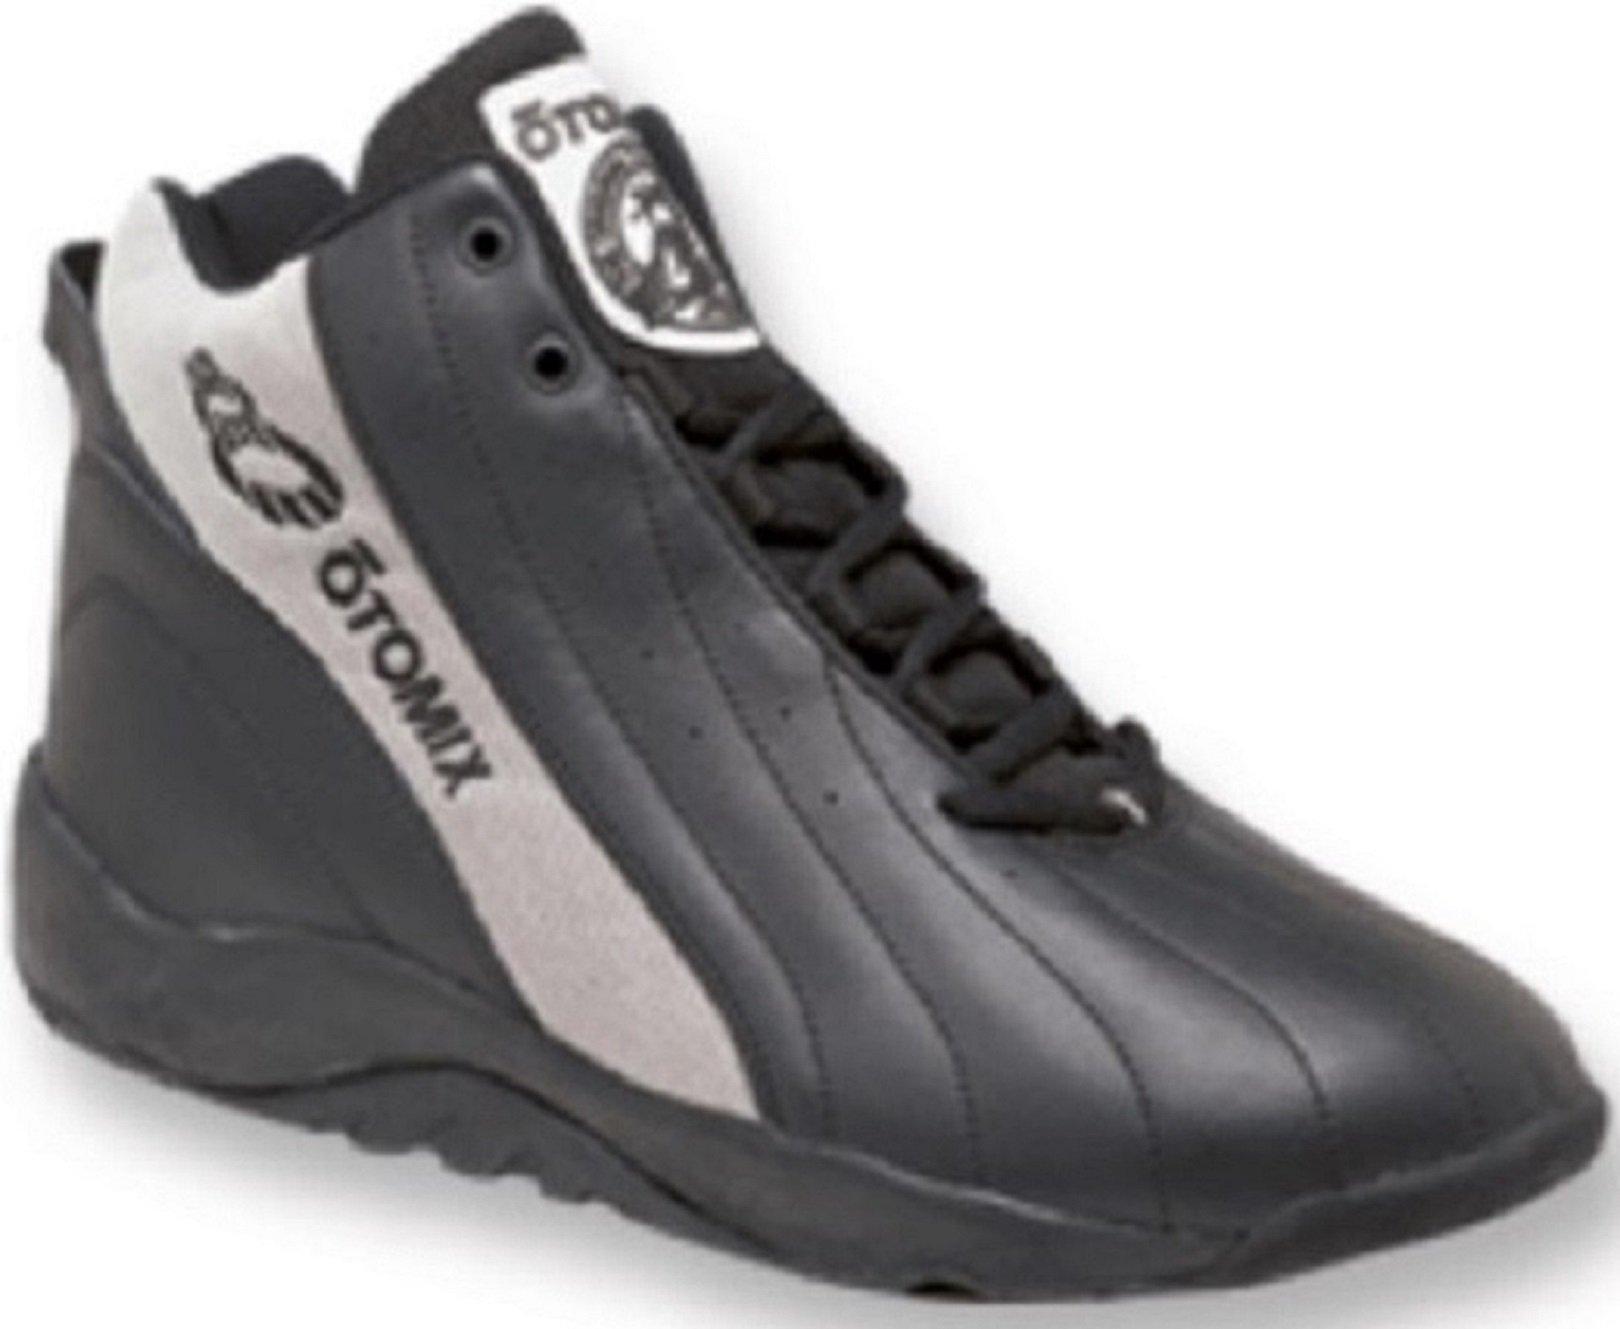 Otomix Versa Trainer Pro Men's Bodybuilding Shoes (7.5, Black) by Otomix